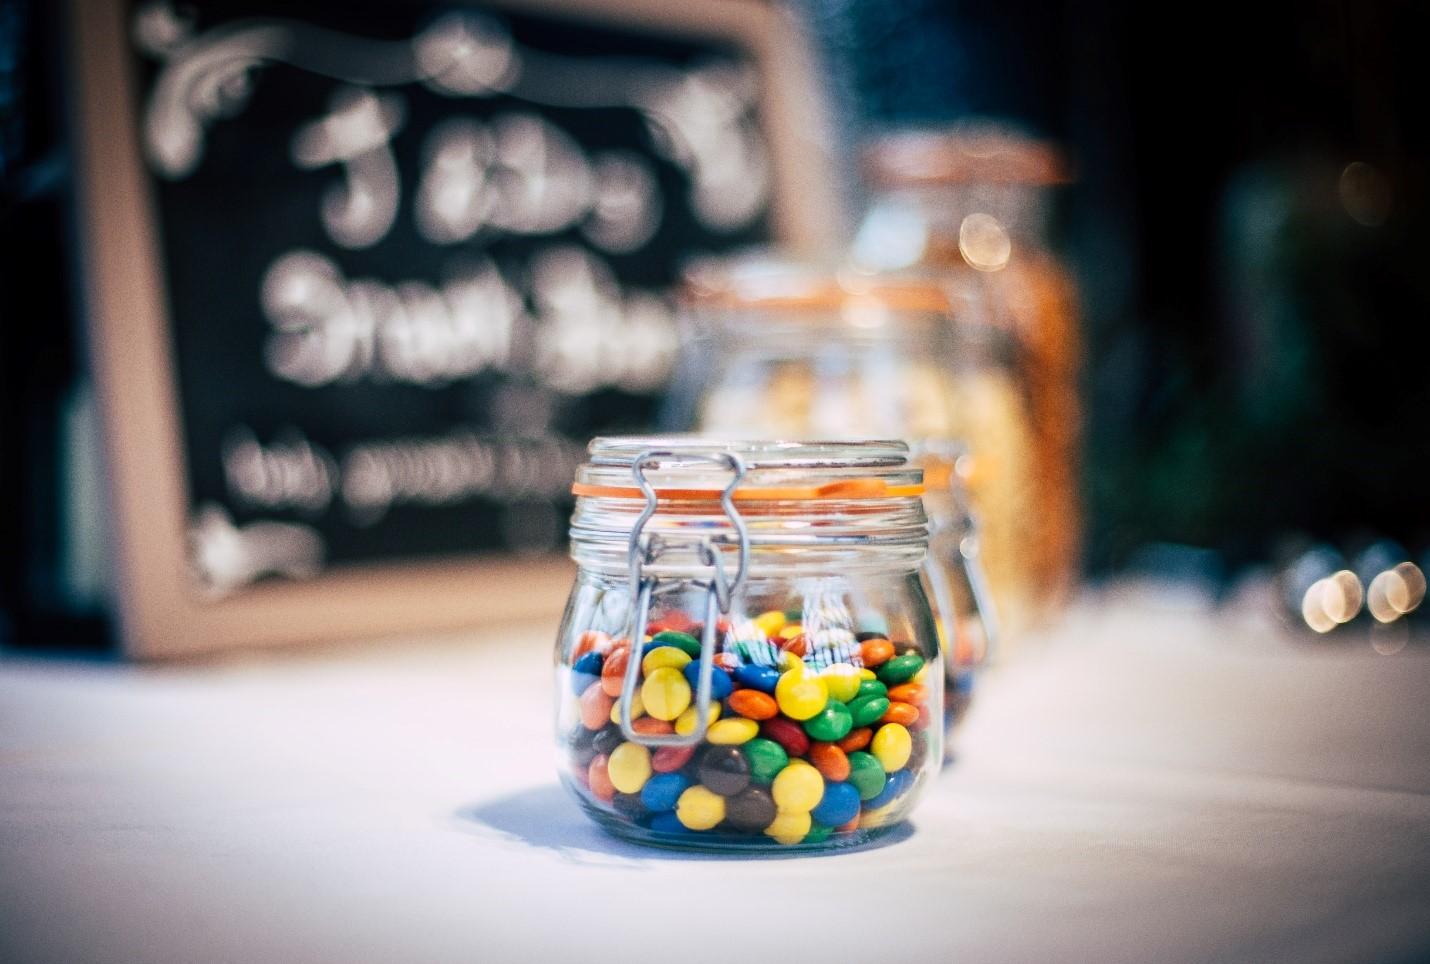 Halloween candies in a jar.